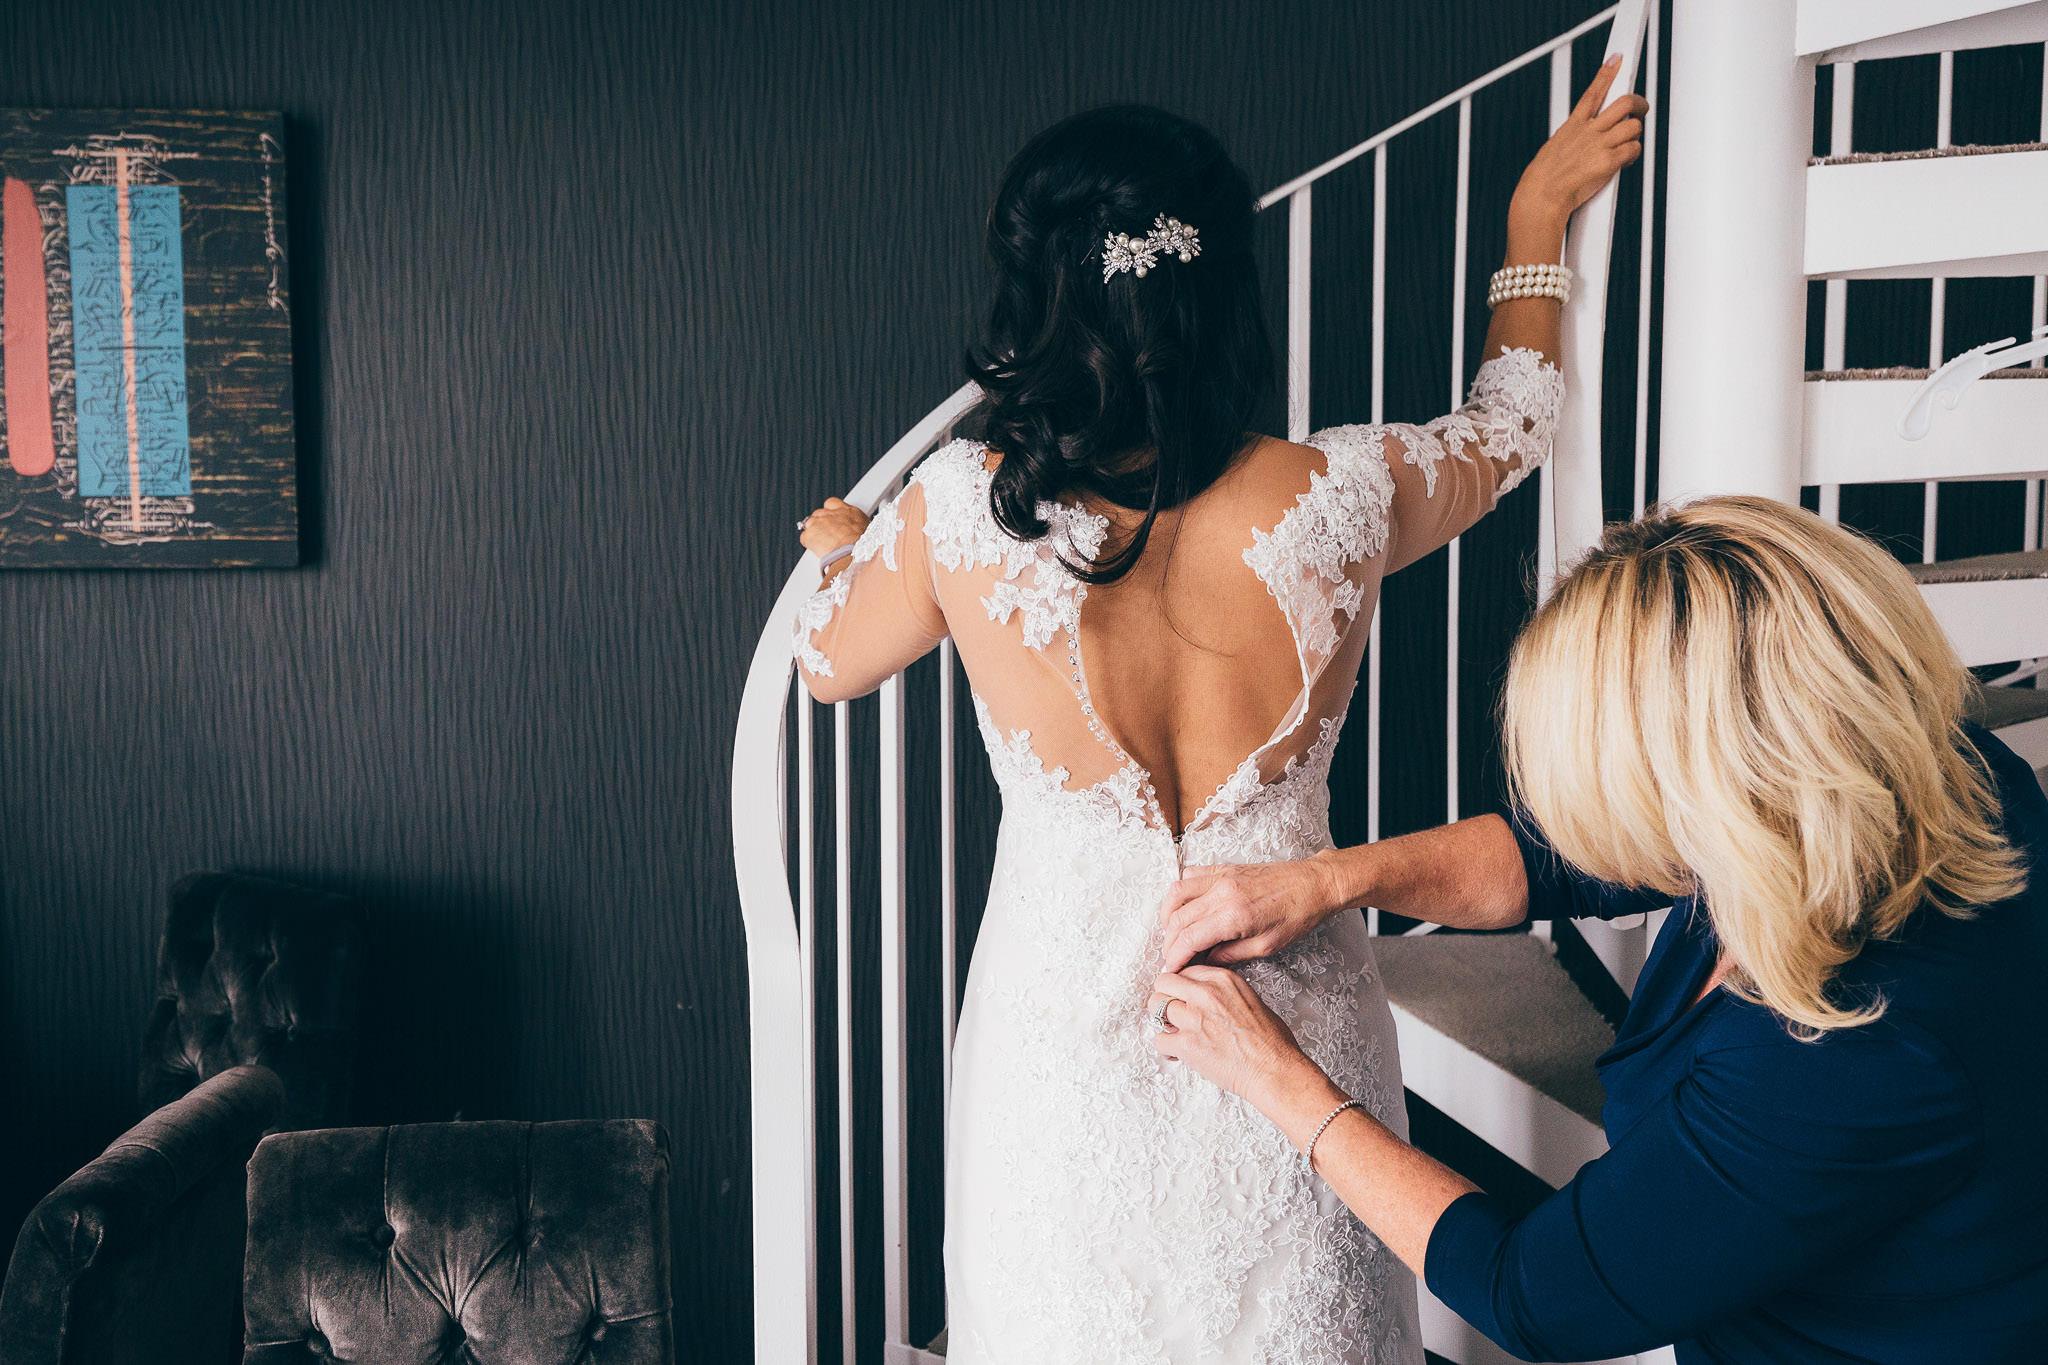 Wedding+Photographer+Norway+Bryllupsfotograf+Casey+Arneson+MK-110.jpg